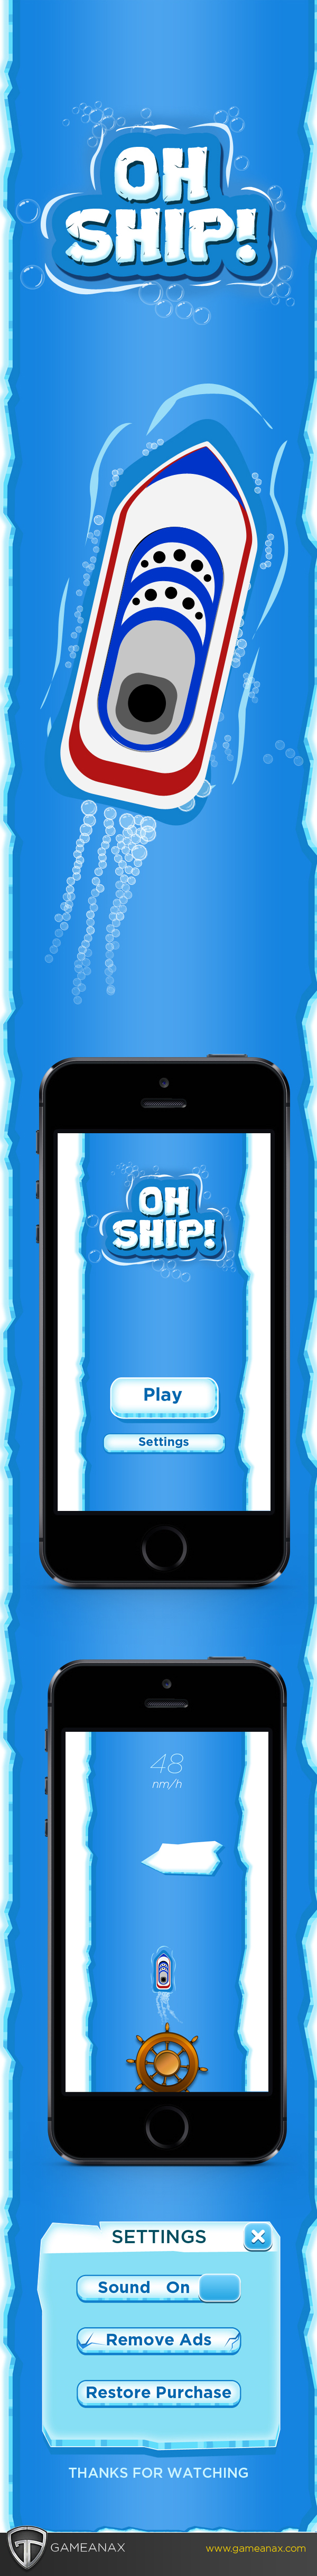 mobile gaming Gaming Games UI ux iphone iPad ships ship ice